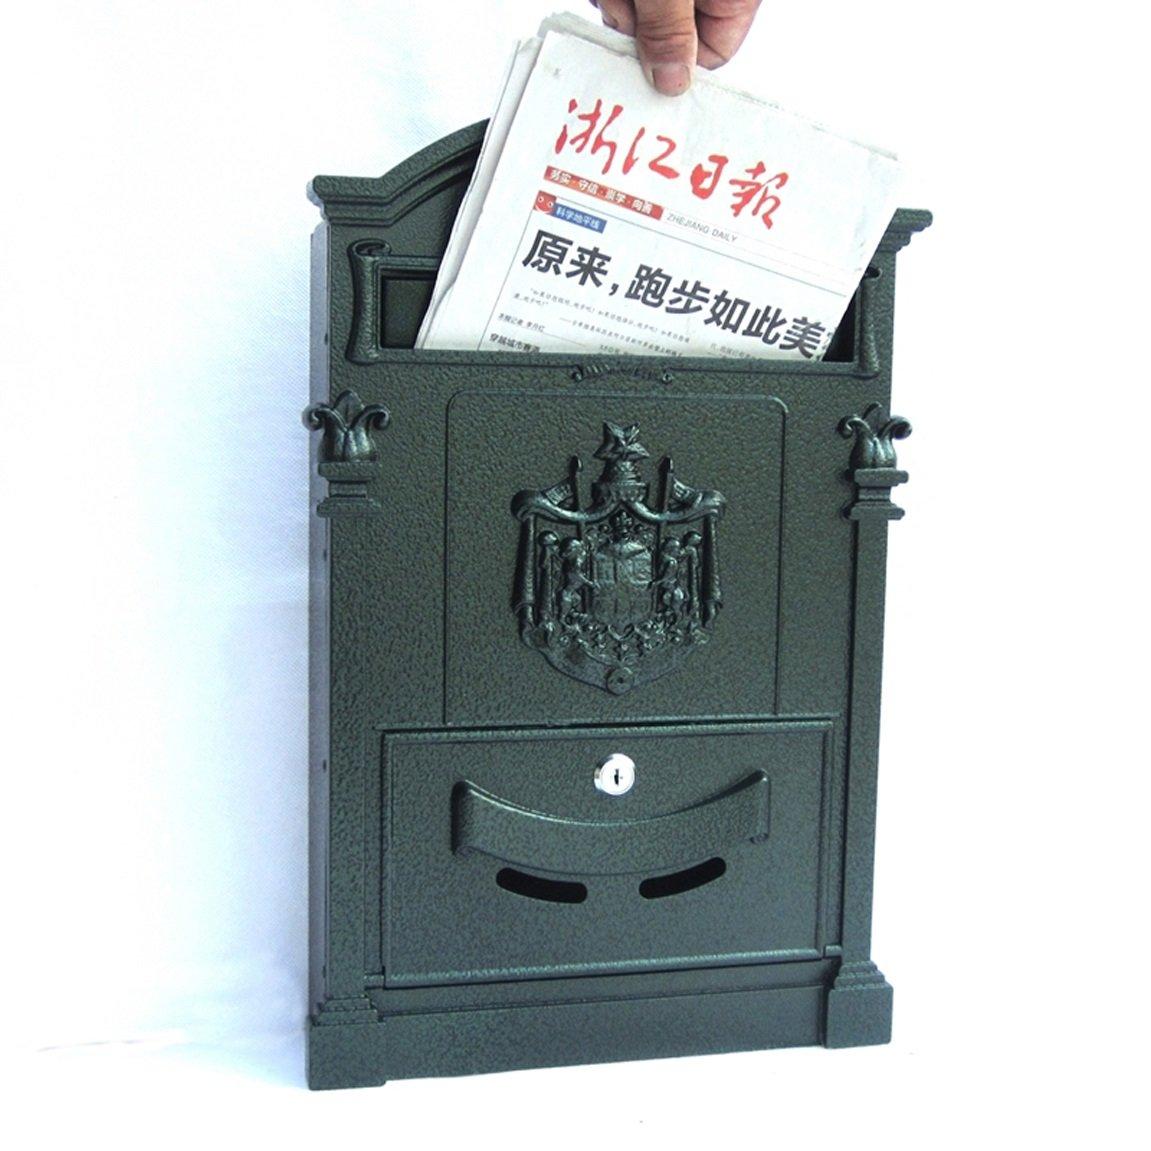 HZB ヨーロッパスタイルのヴィラ郵便受けアウトドアアンティークウォールタイプのメールボックス、黒っぽい緑   B07H83VHMD